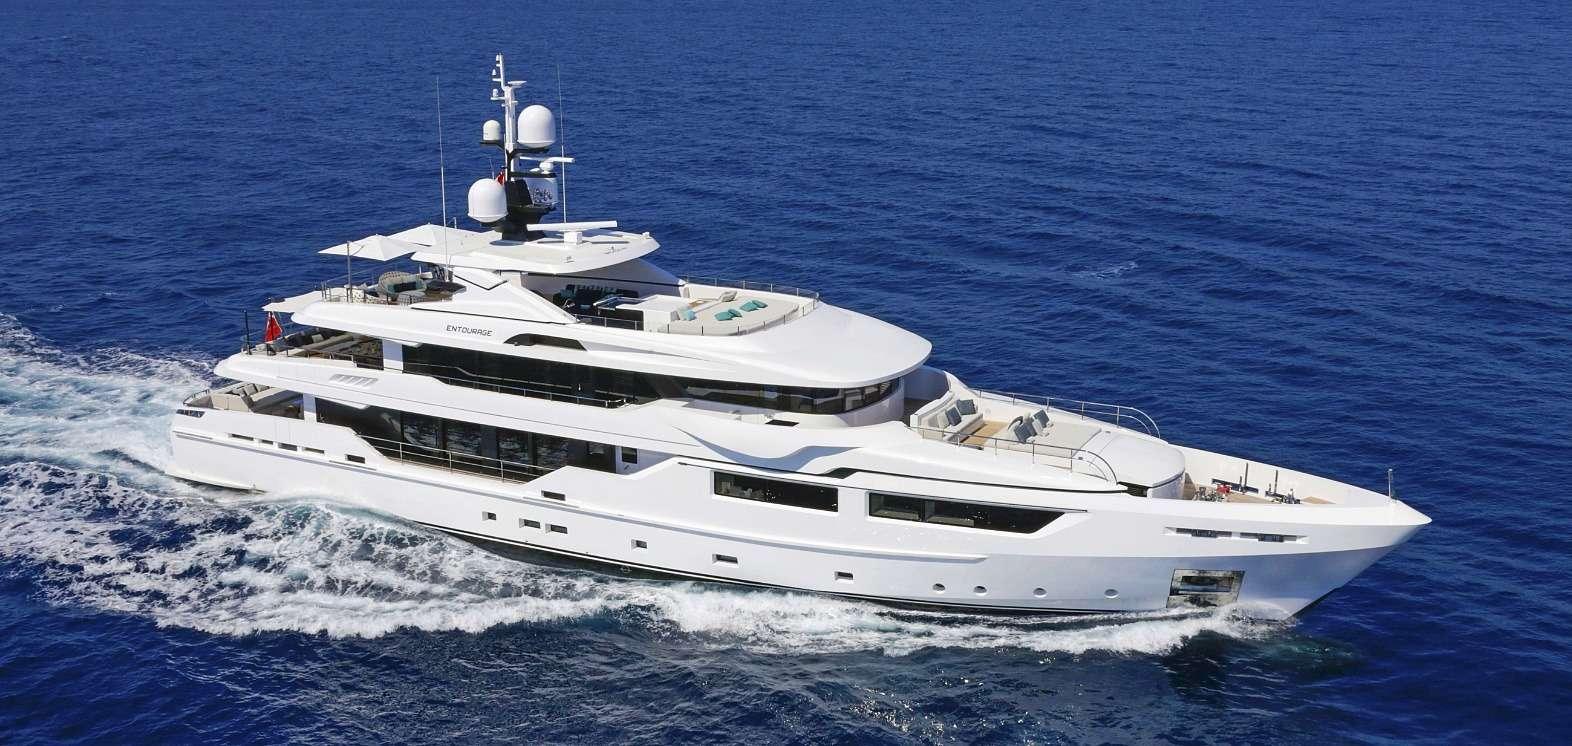 Power Yacht 'Power', 12 PAX, 9 Crew, 152.00 Ft, 46.00 Meters, Built 2014, Admiral Marine, Refit Year